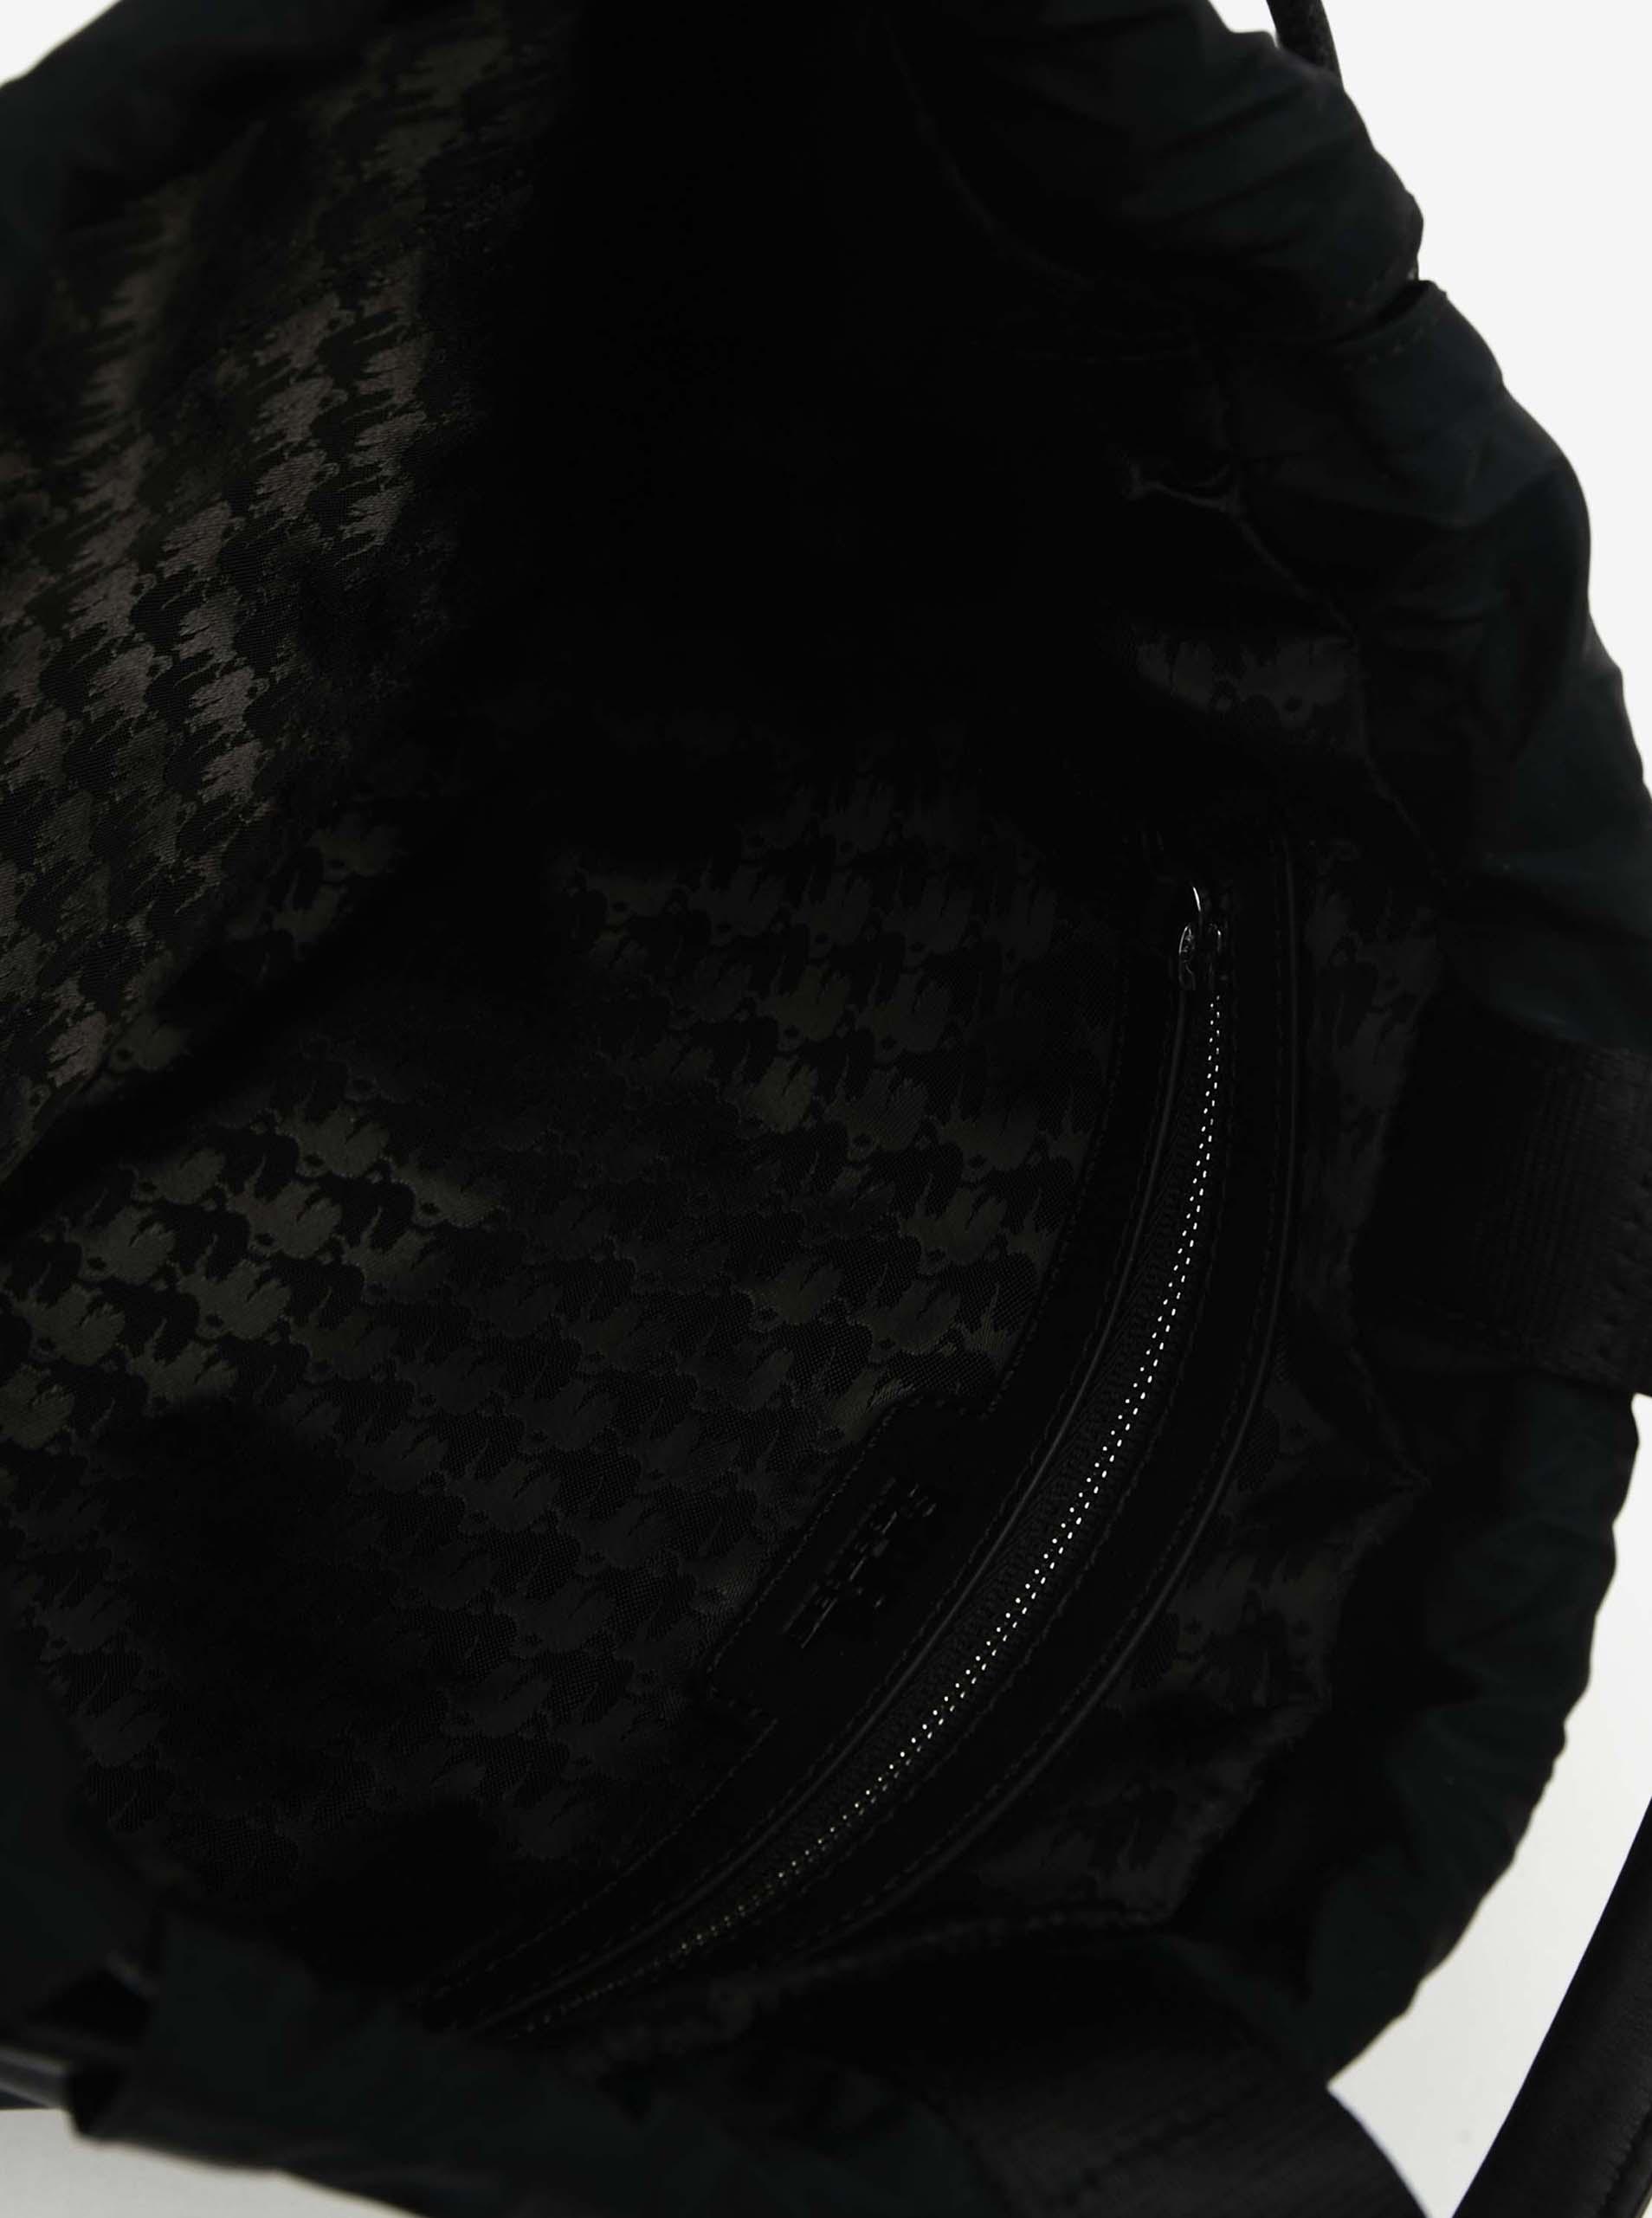 KARL LAGERFELD Plecak damski czarny